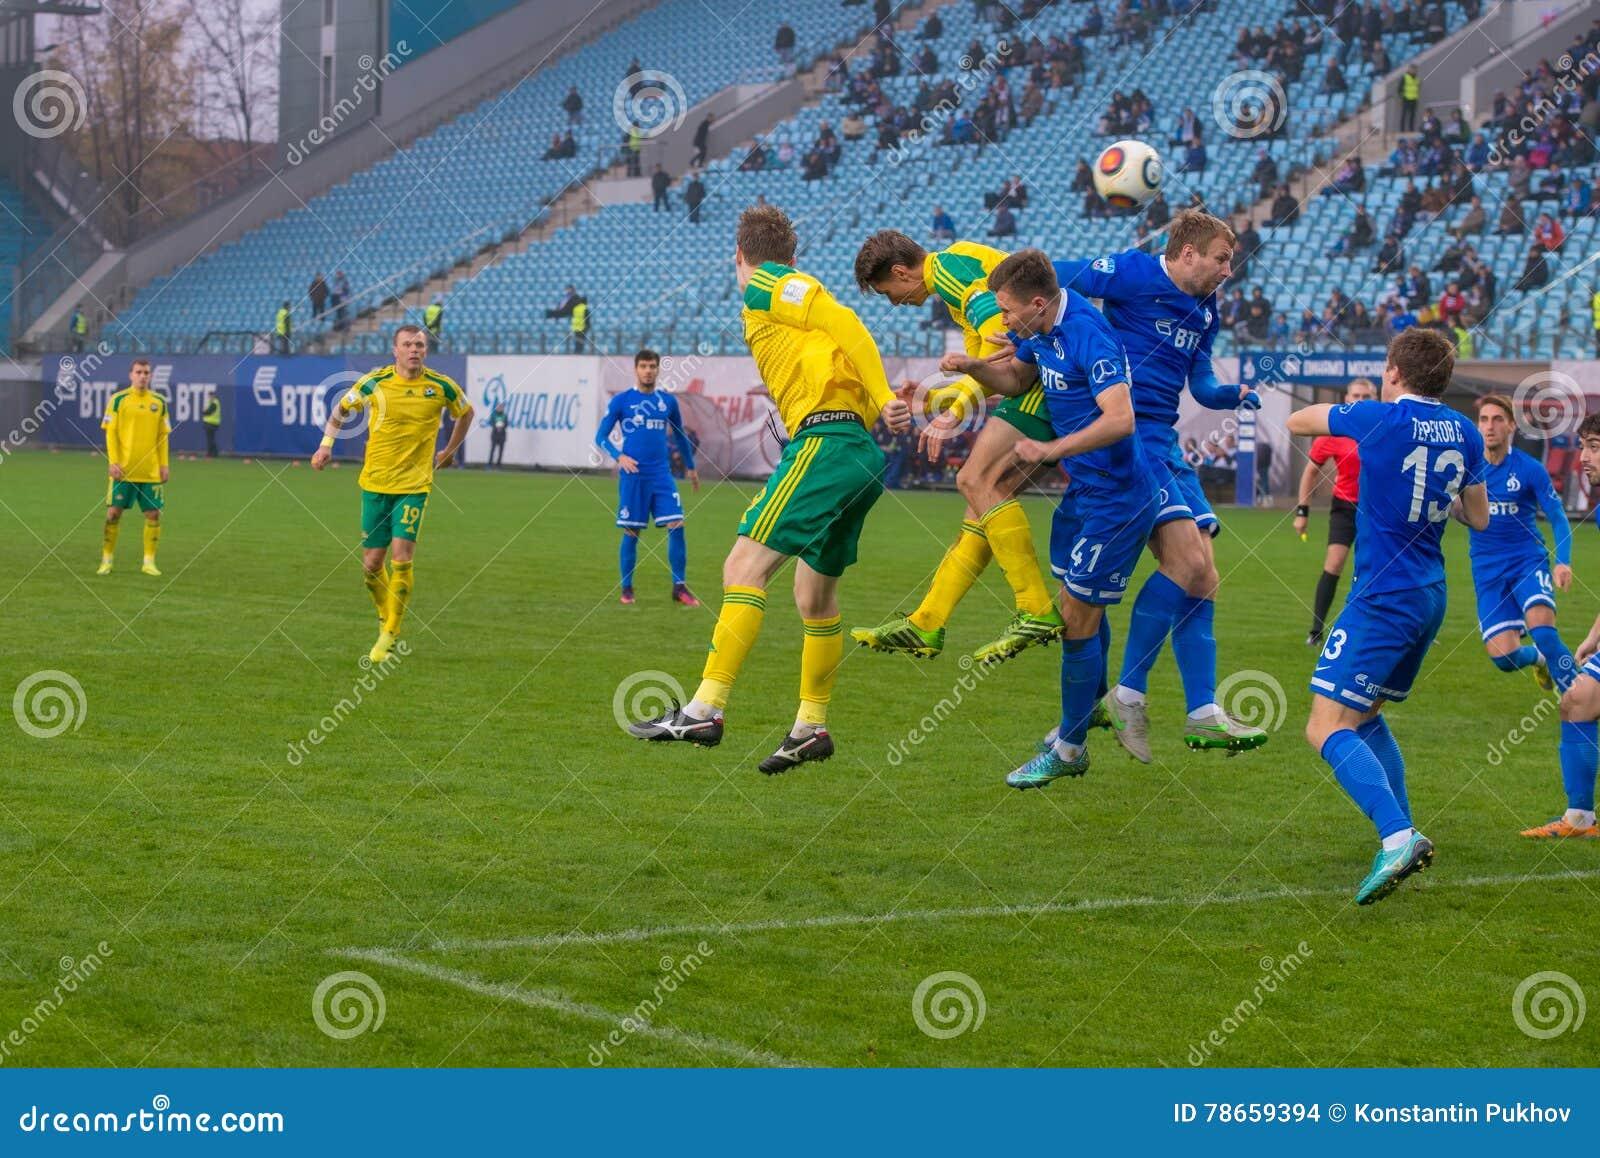 Dynamo Moscow Vs Kuban Krasnodar Editorial Stock Image Image Of Footballer Arena 78659394